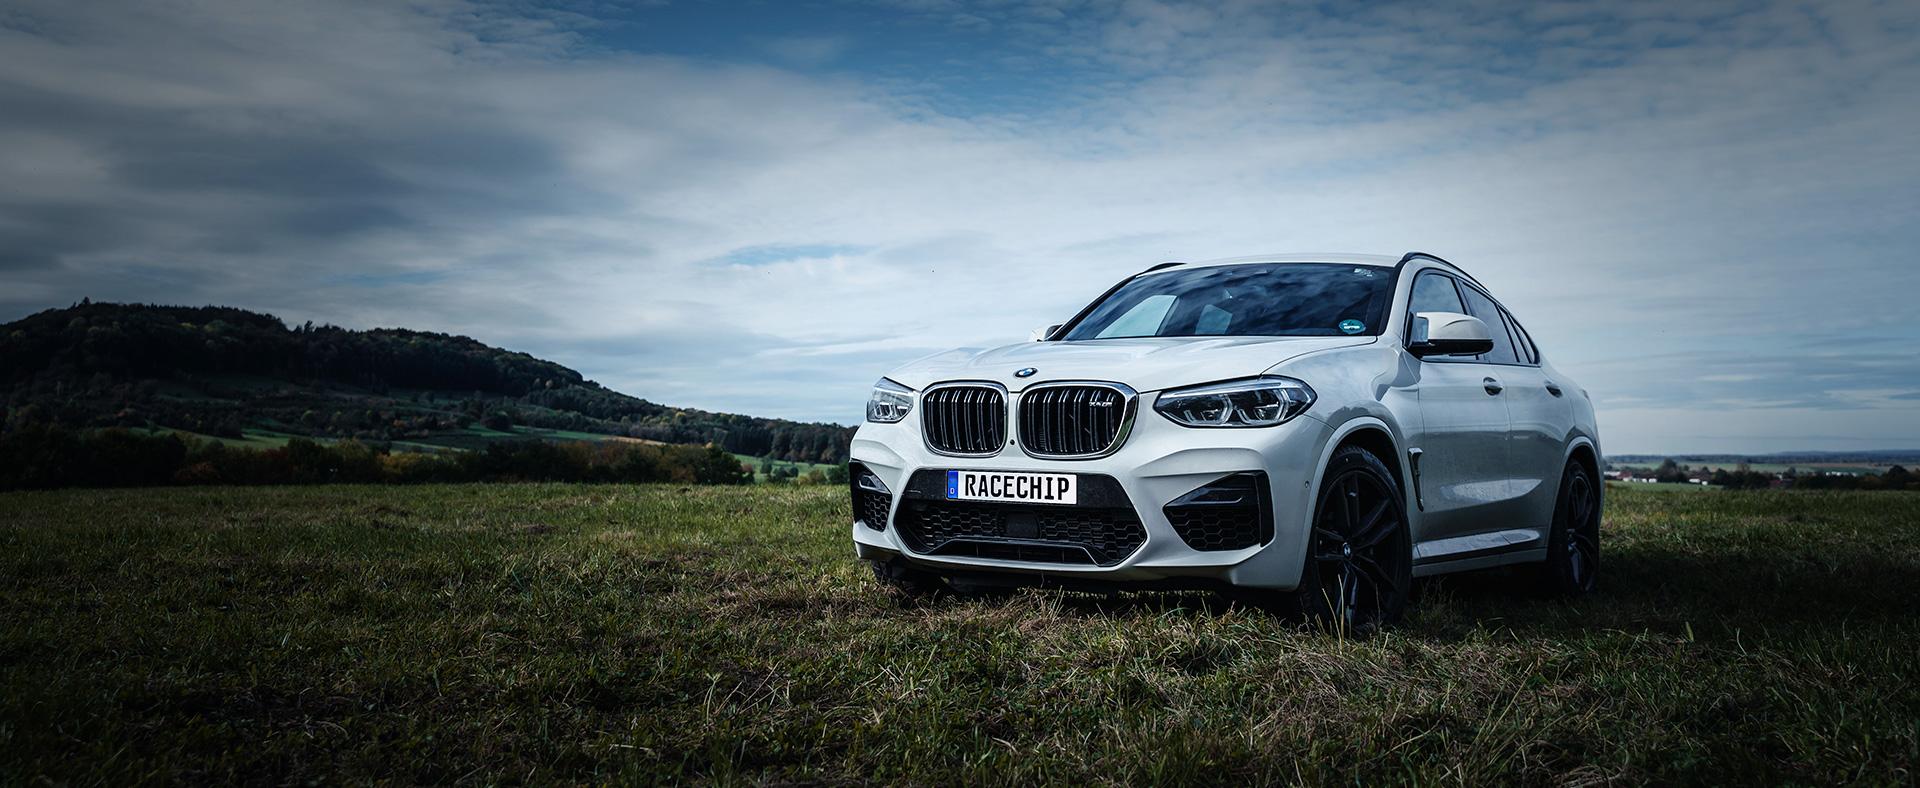 BMW M135i vs. M140i – ist der M135i ein würdiger Nachfolger?